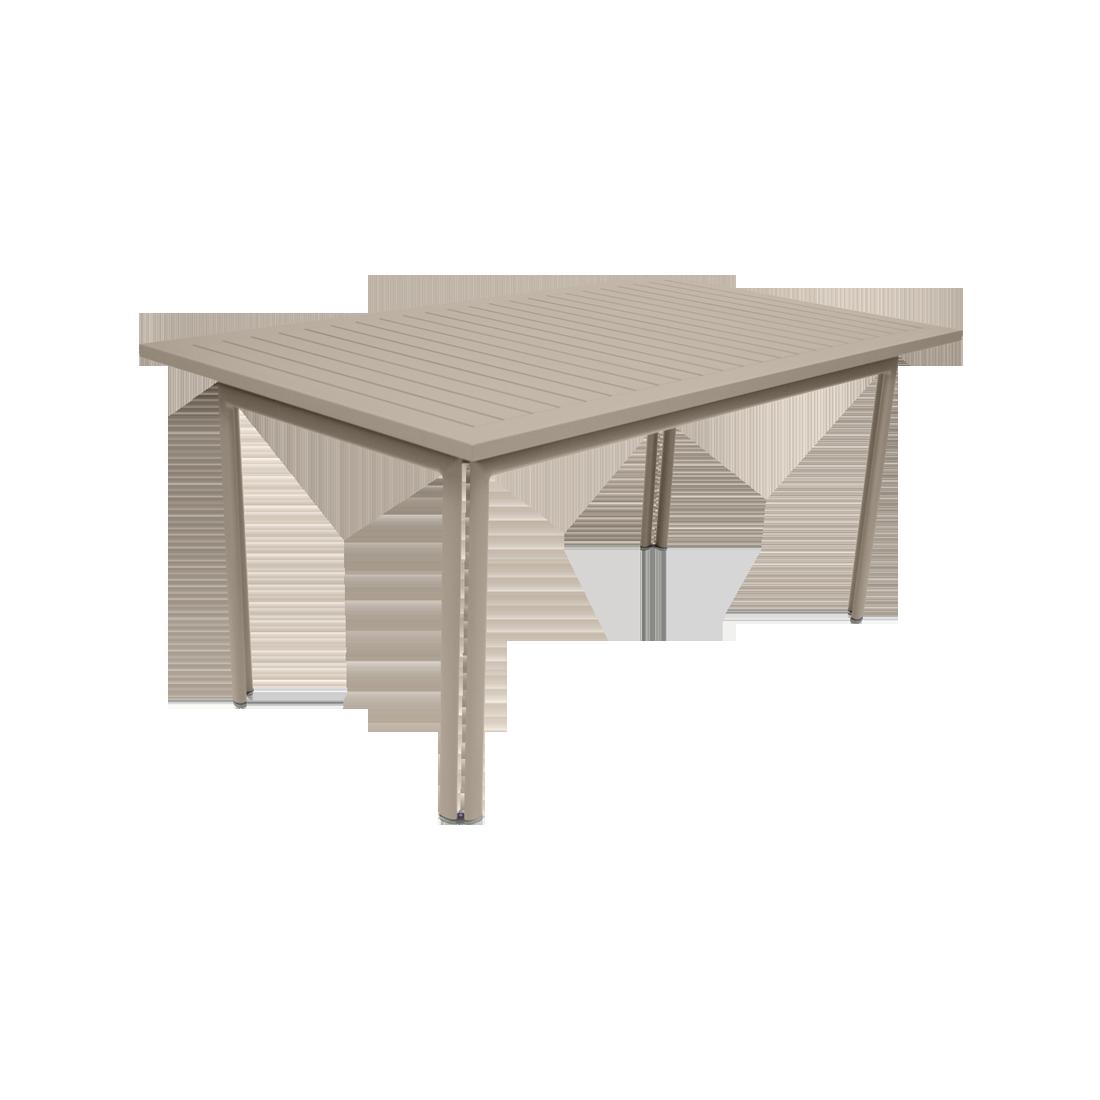 table metal, table de jardin, table rectangulaire, table beige, table 8 personnes